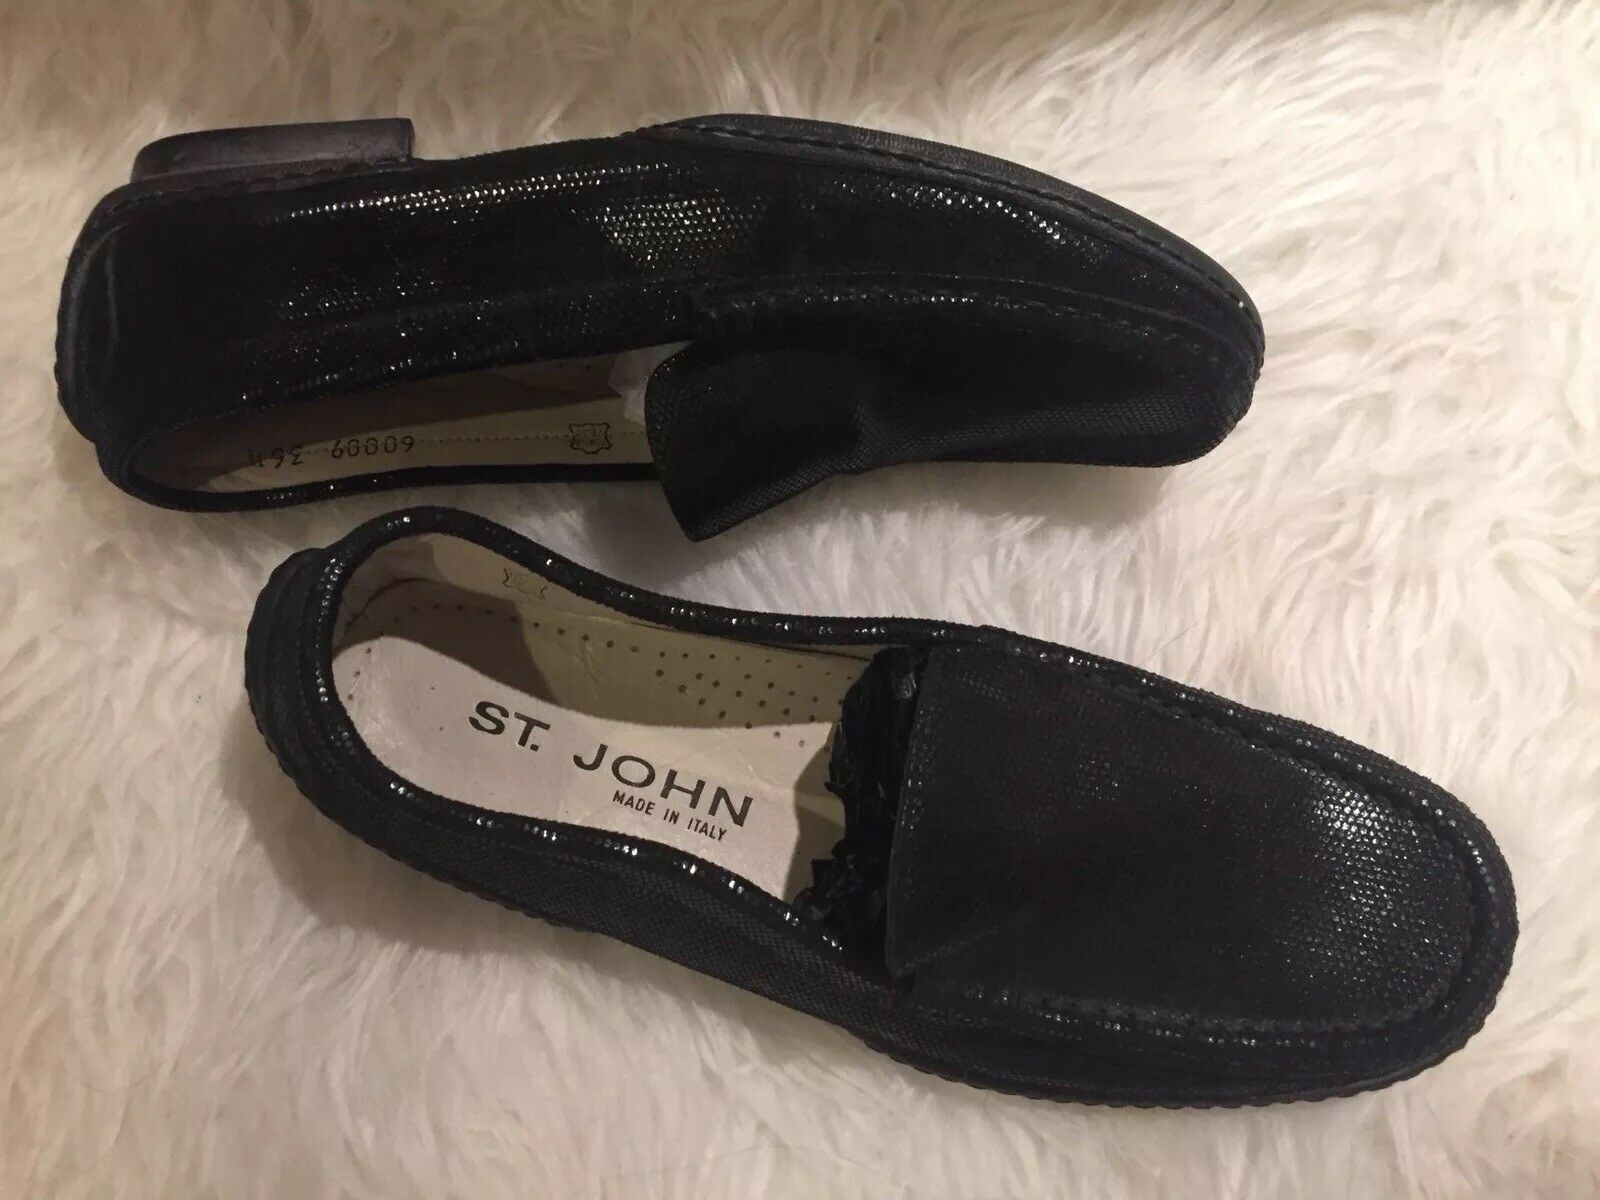 St John John John antideslizante en mocasines pisos Negro Brillo Talla 6.5  nueva marca